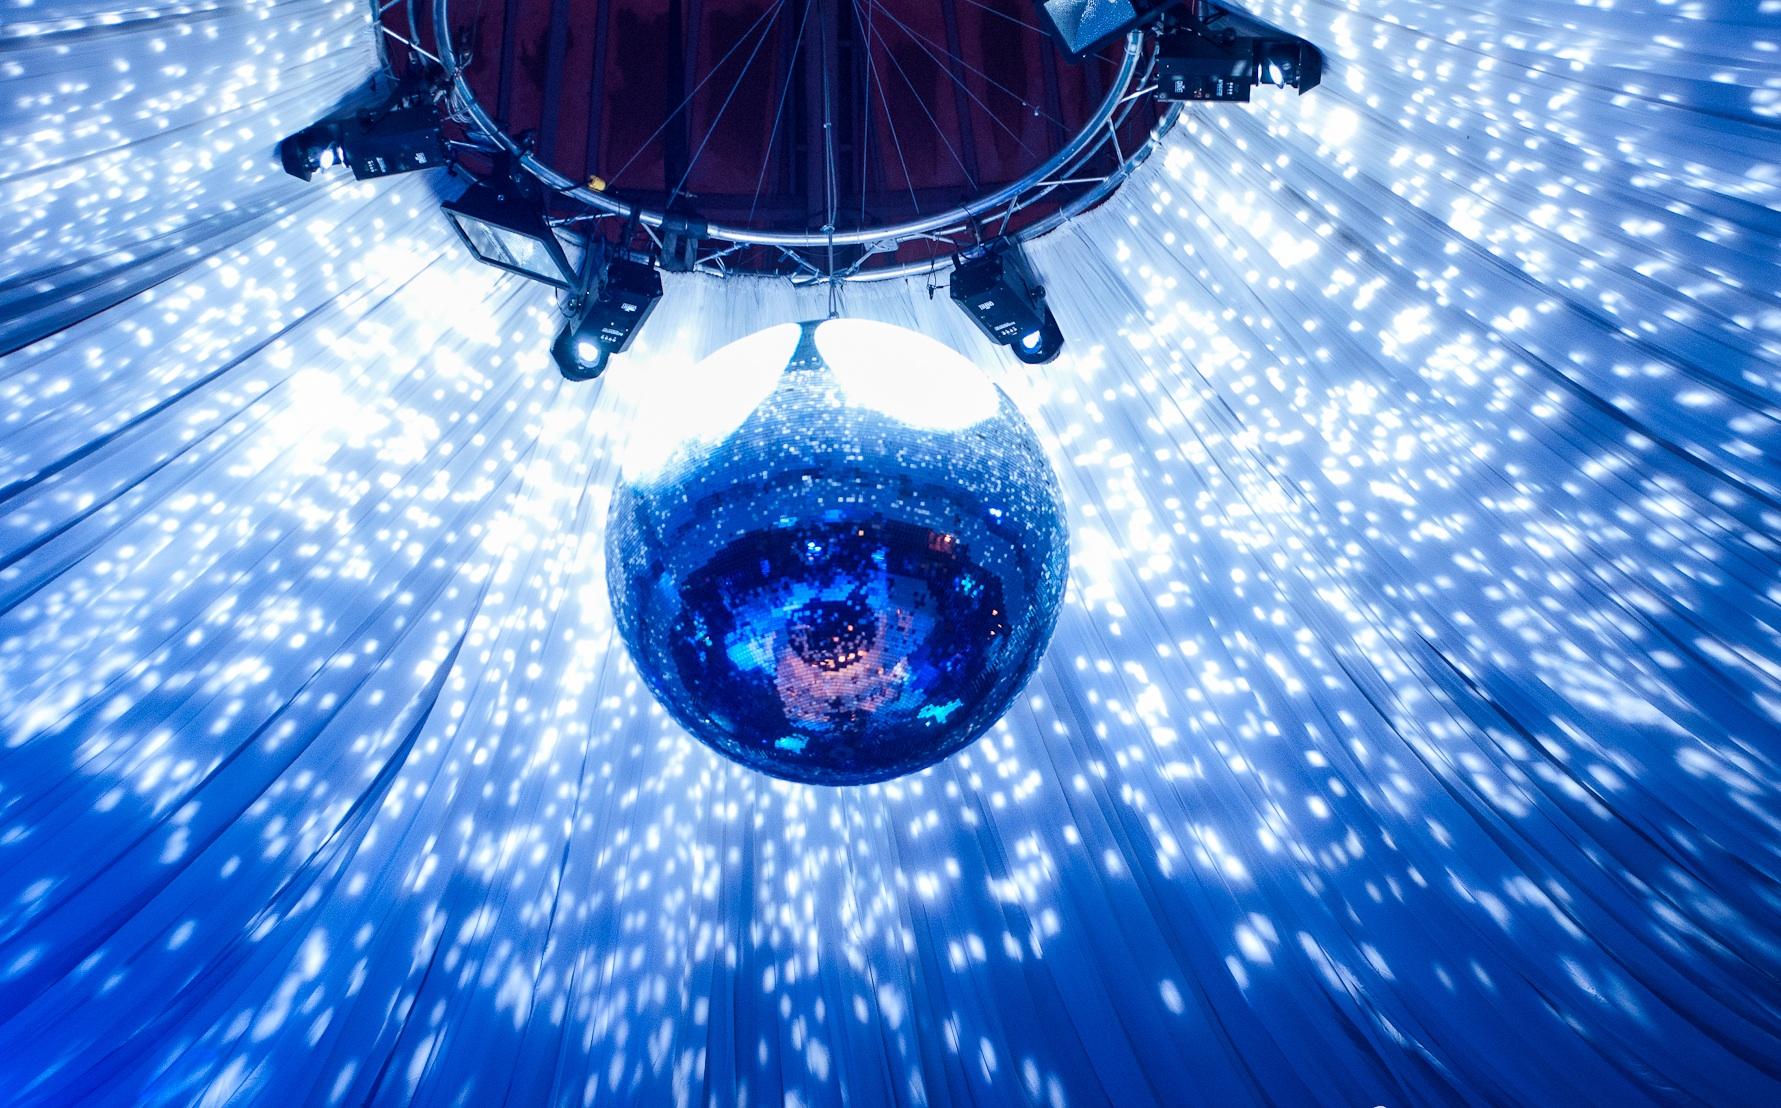 www.ellianmarie.comhttps://www.facebook.com/EllianMariePhotography